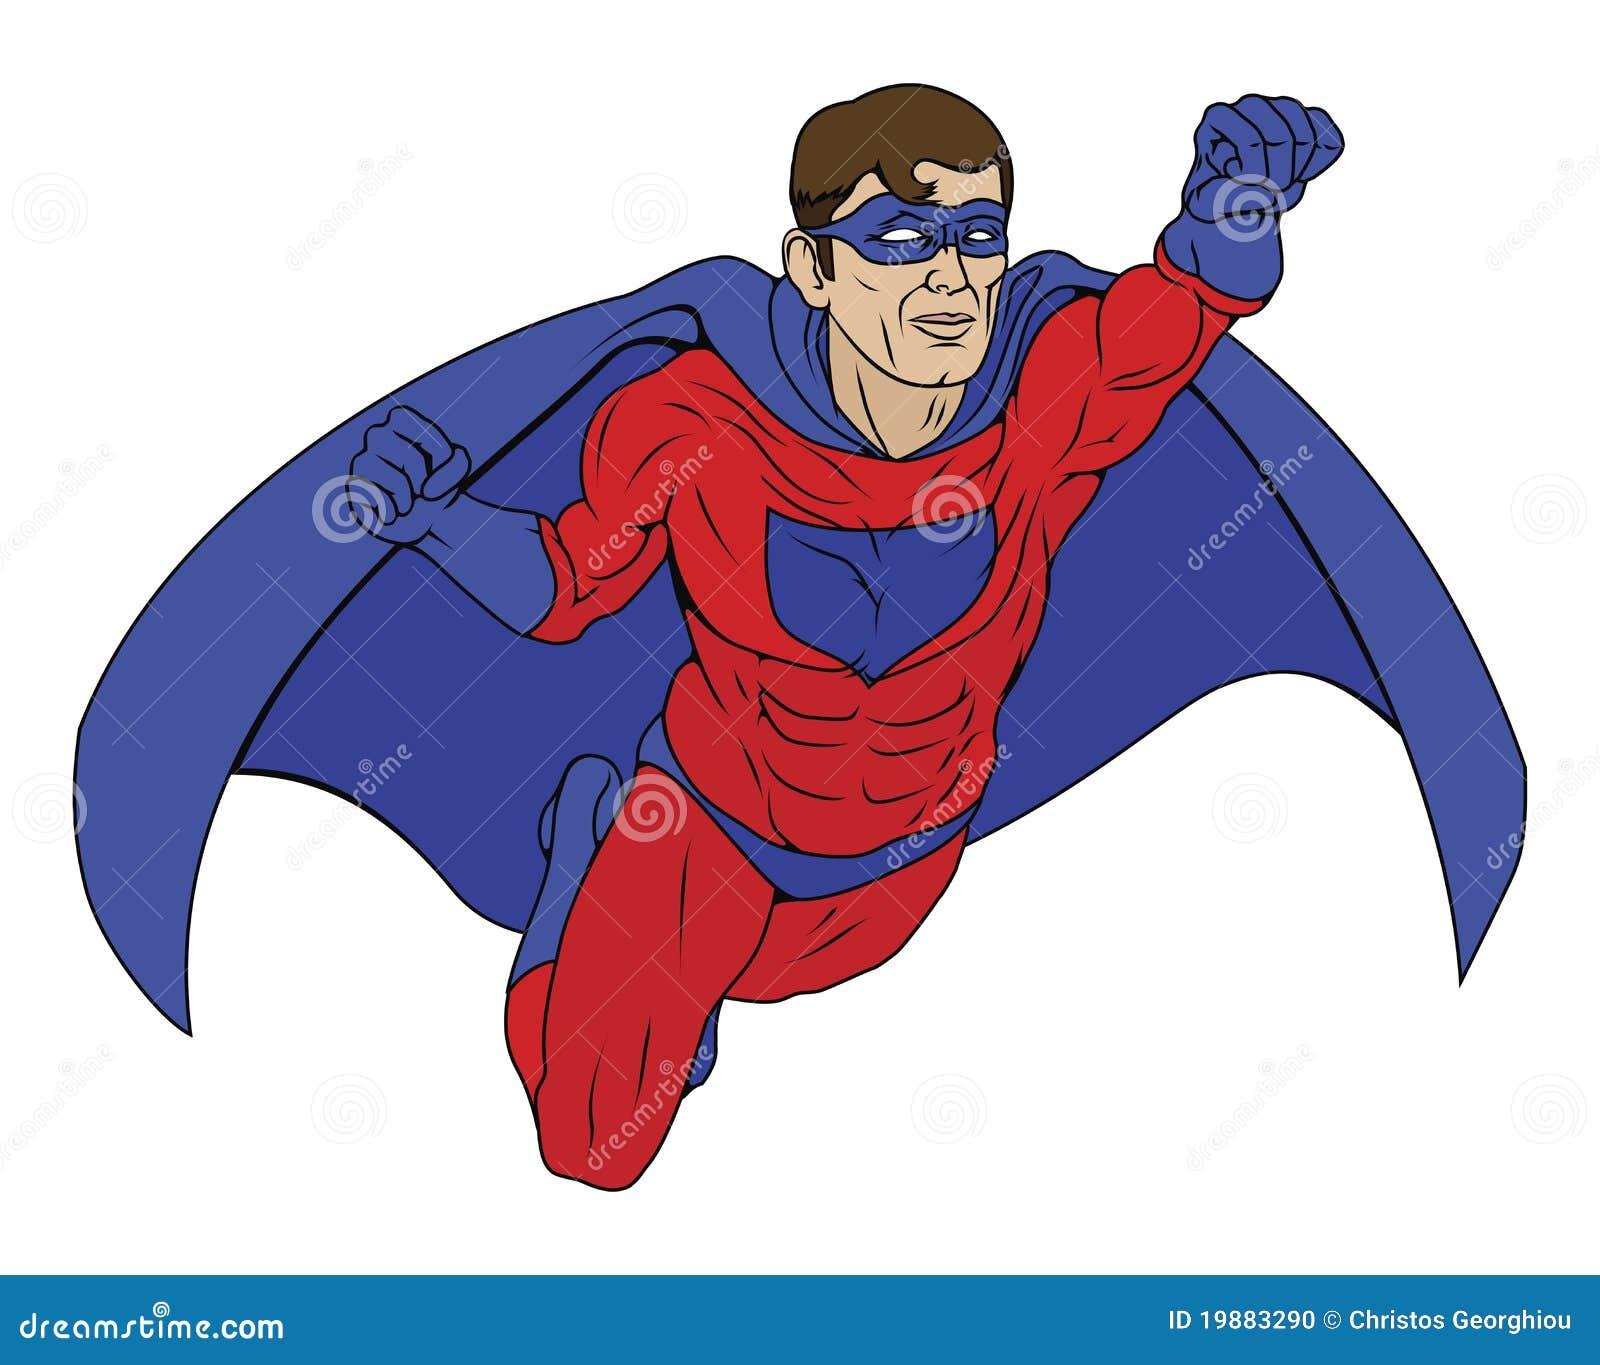 Superhero Illustration Superhero